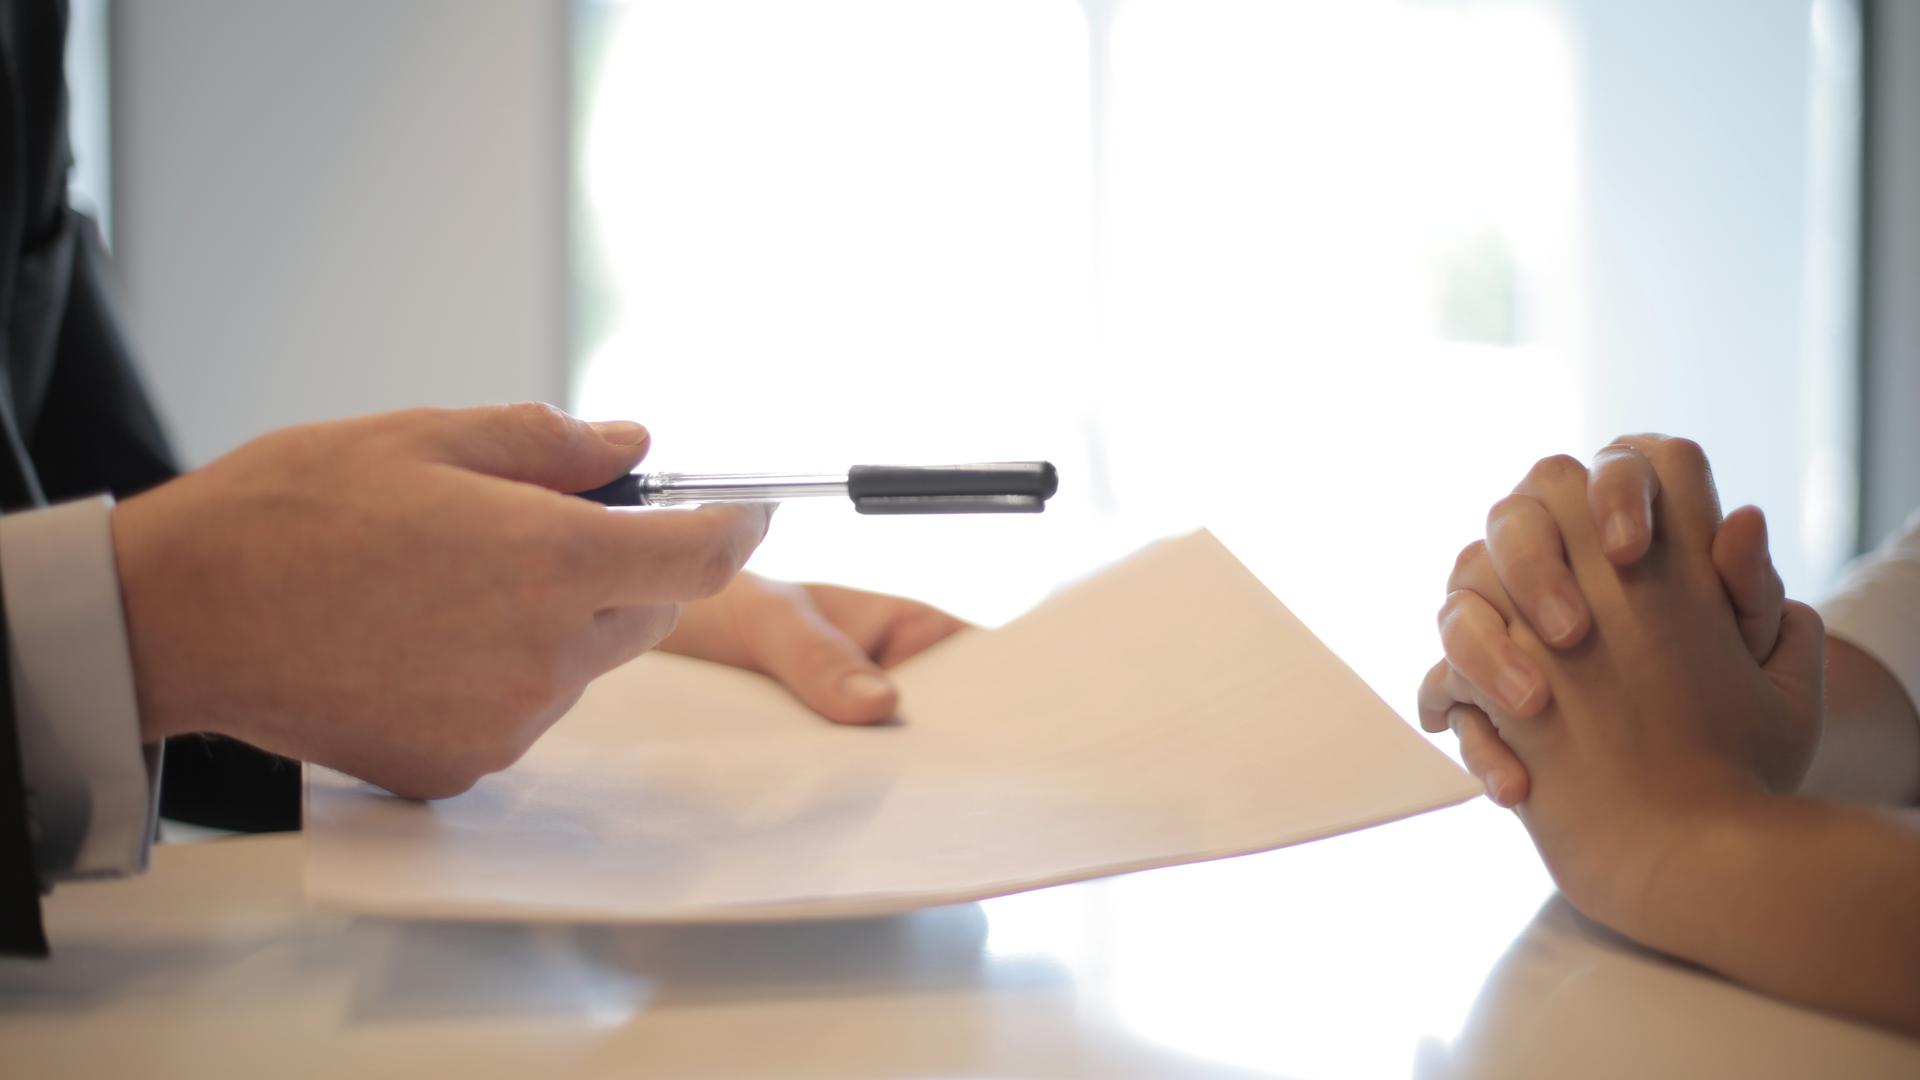 Webinar To Address PPP Loan Forgiveness Application